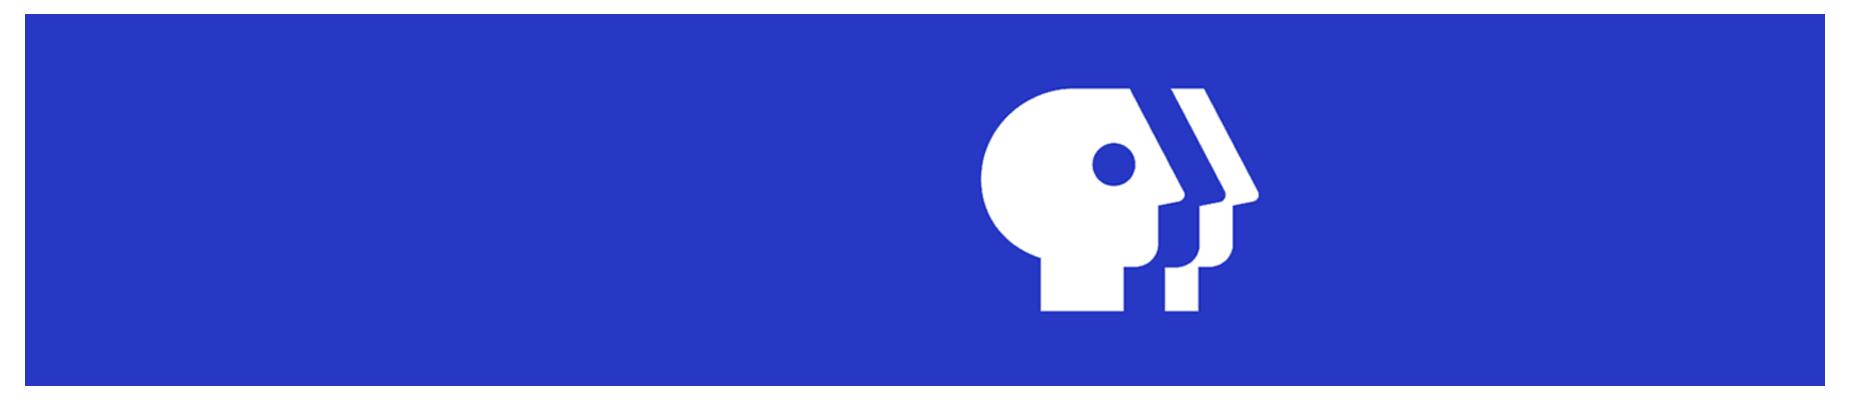 Basin PBS